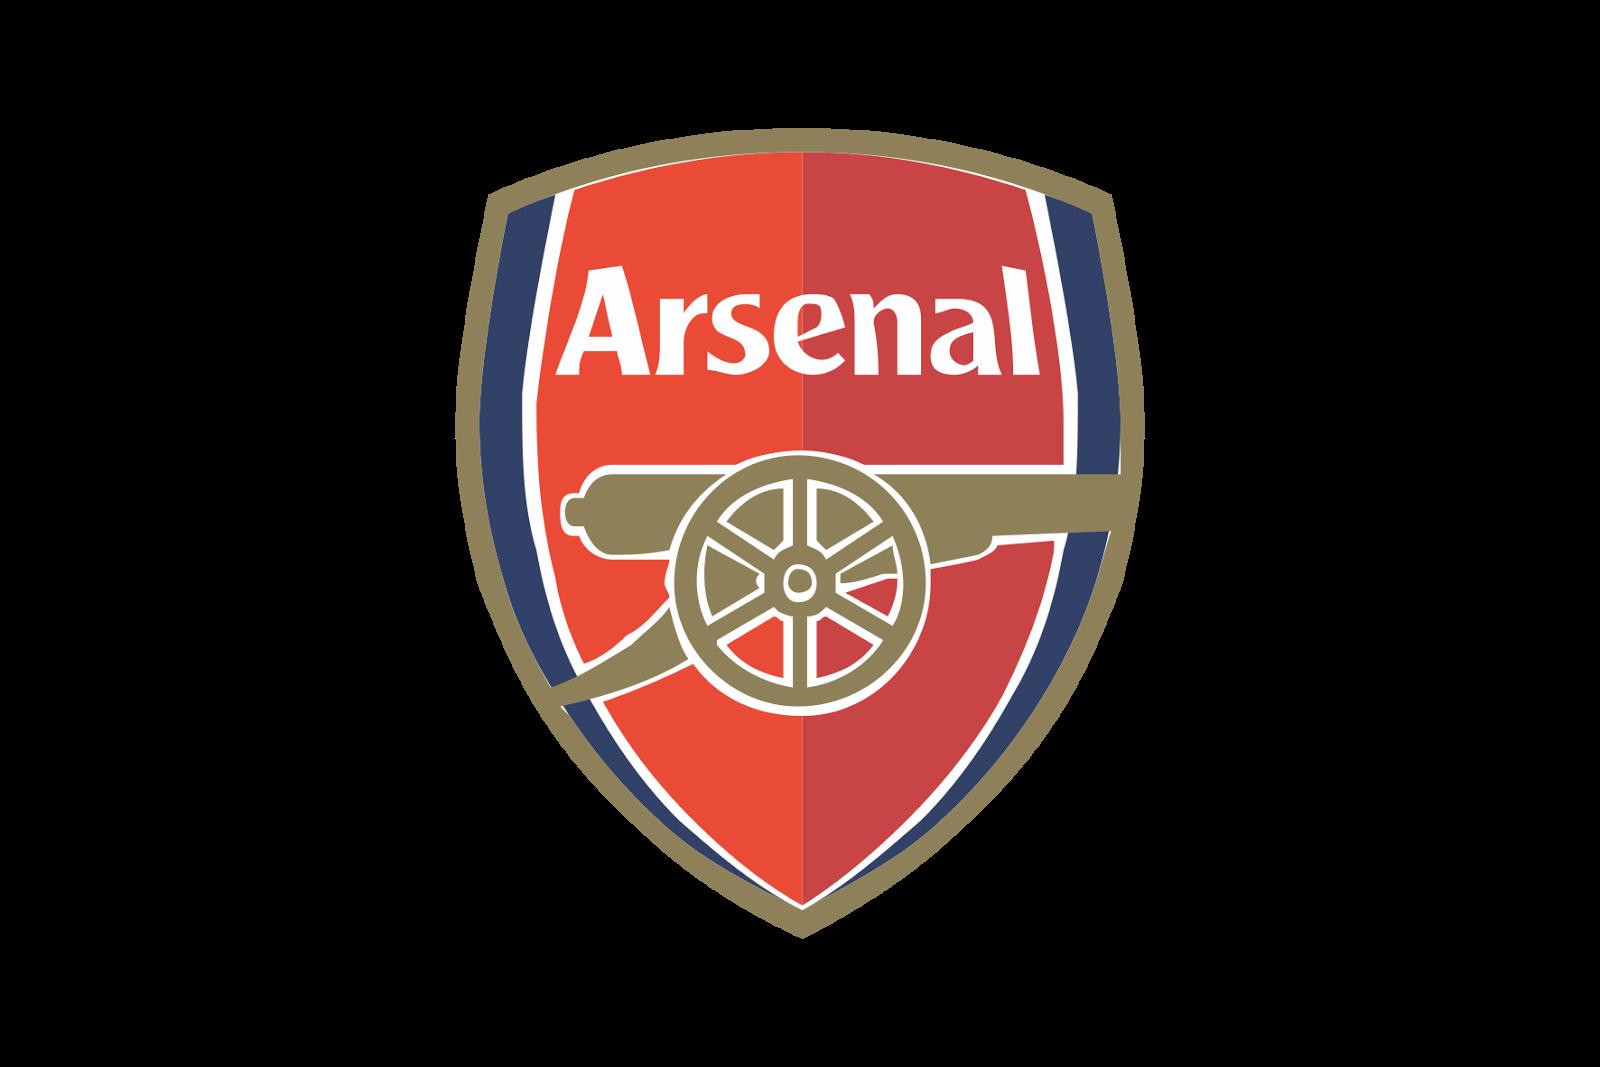 Arsenal logo clipart 512x512 clip art free stock Arsenal F.C. PNG Images Transparent Free Download   PNGMart.com clip art free stock